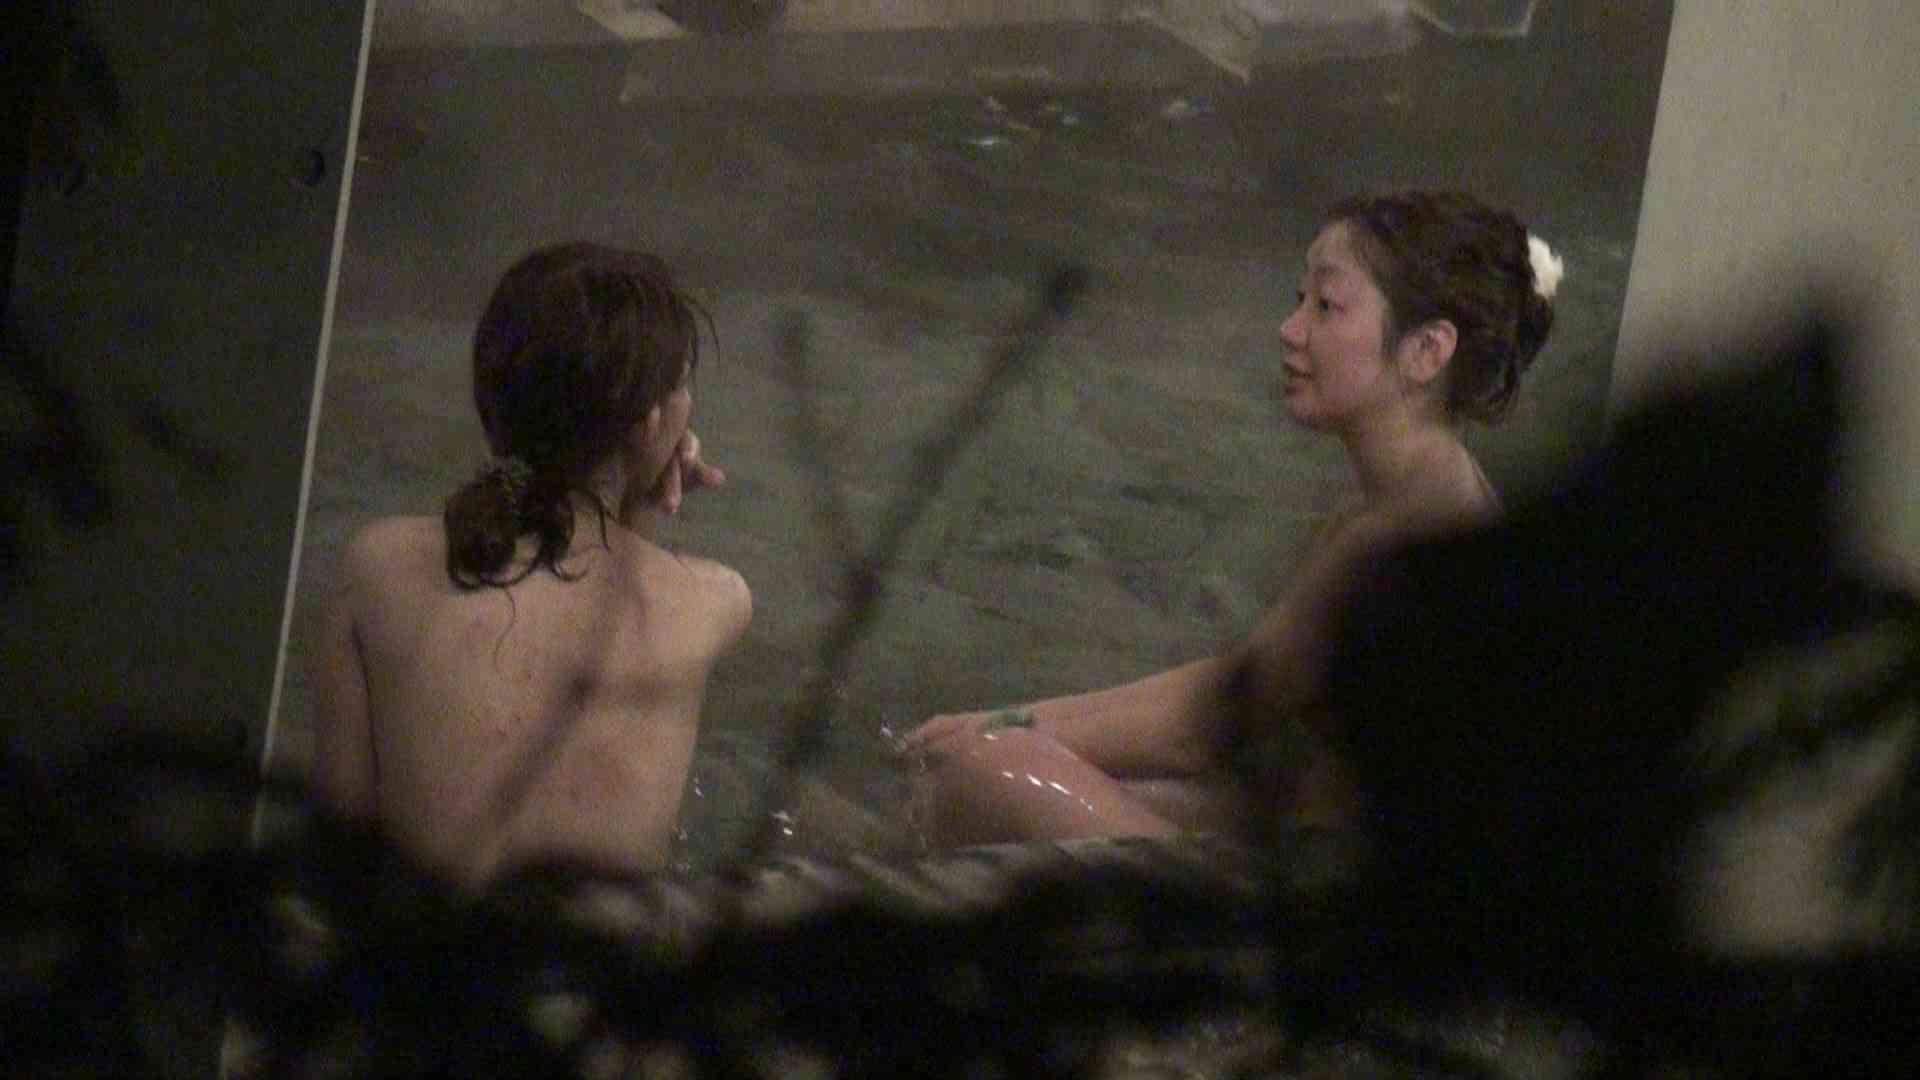 Aquaな露天風呂Vol.422 盗撮映像  61Pix 18